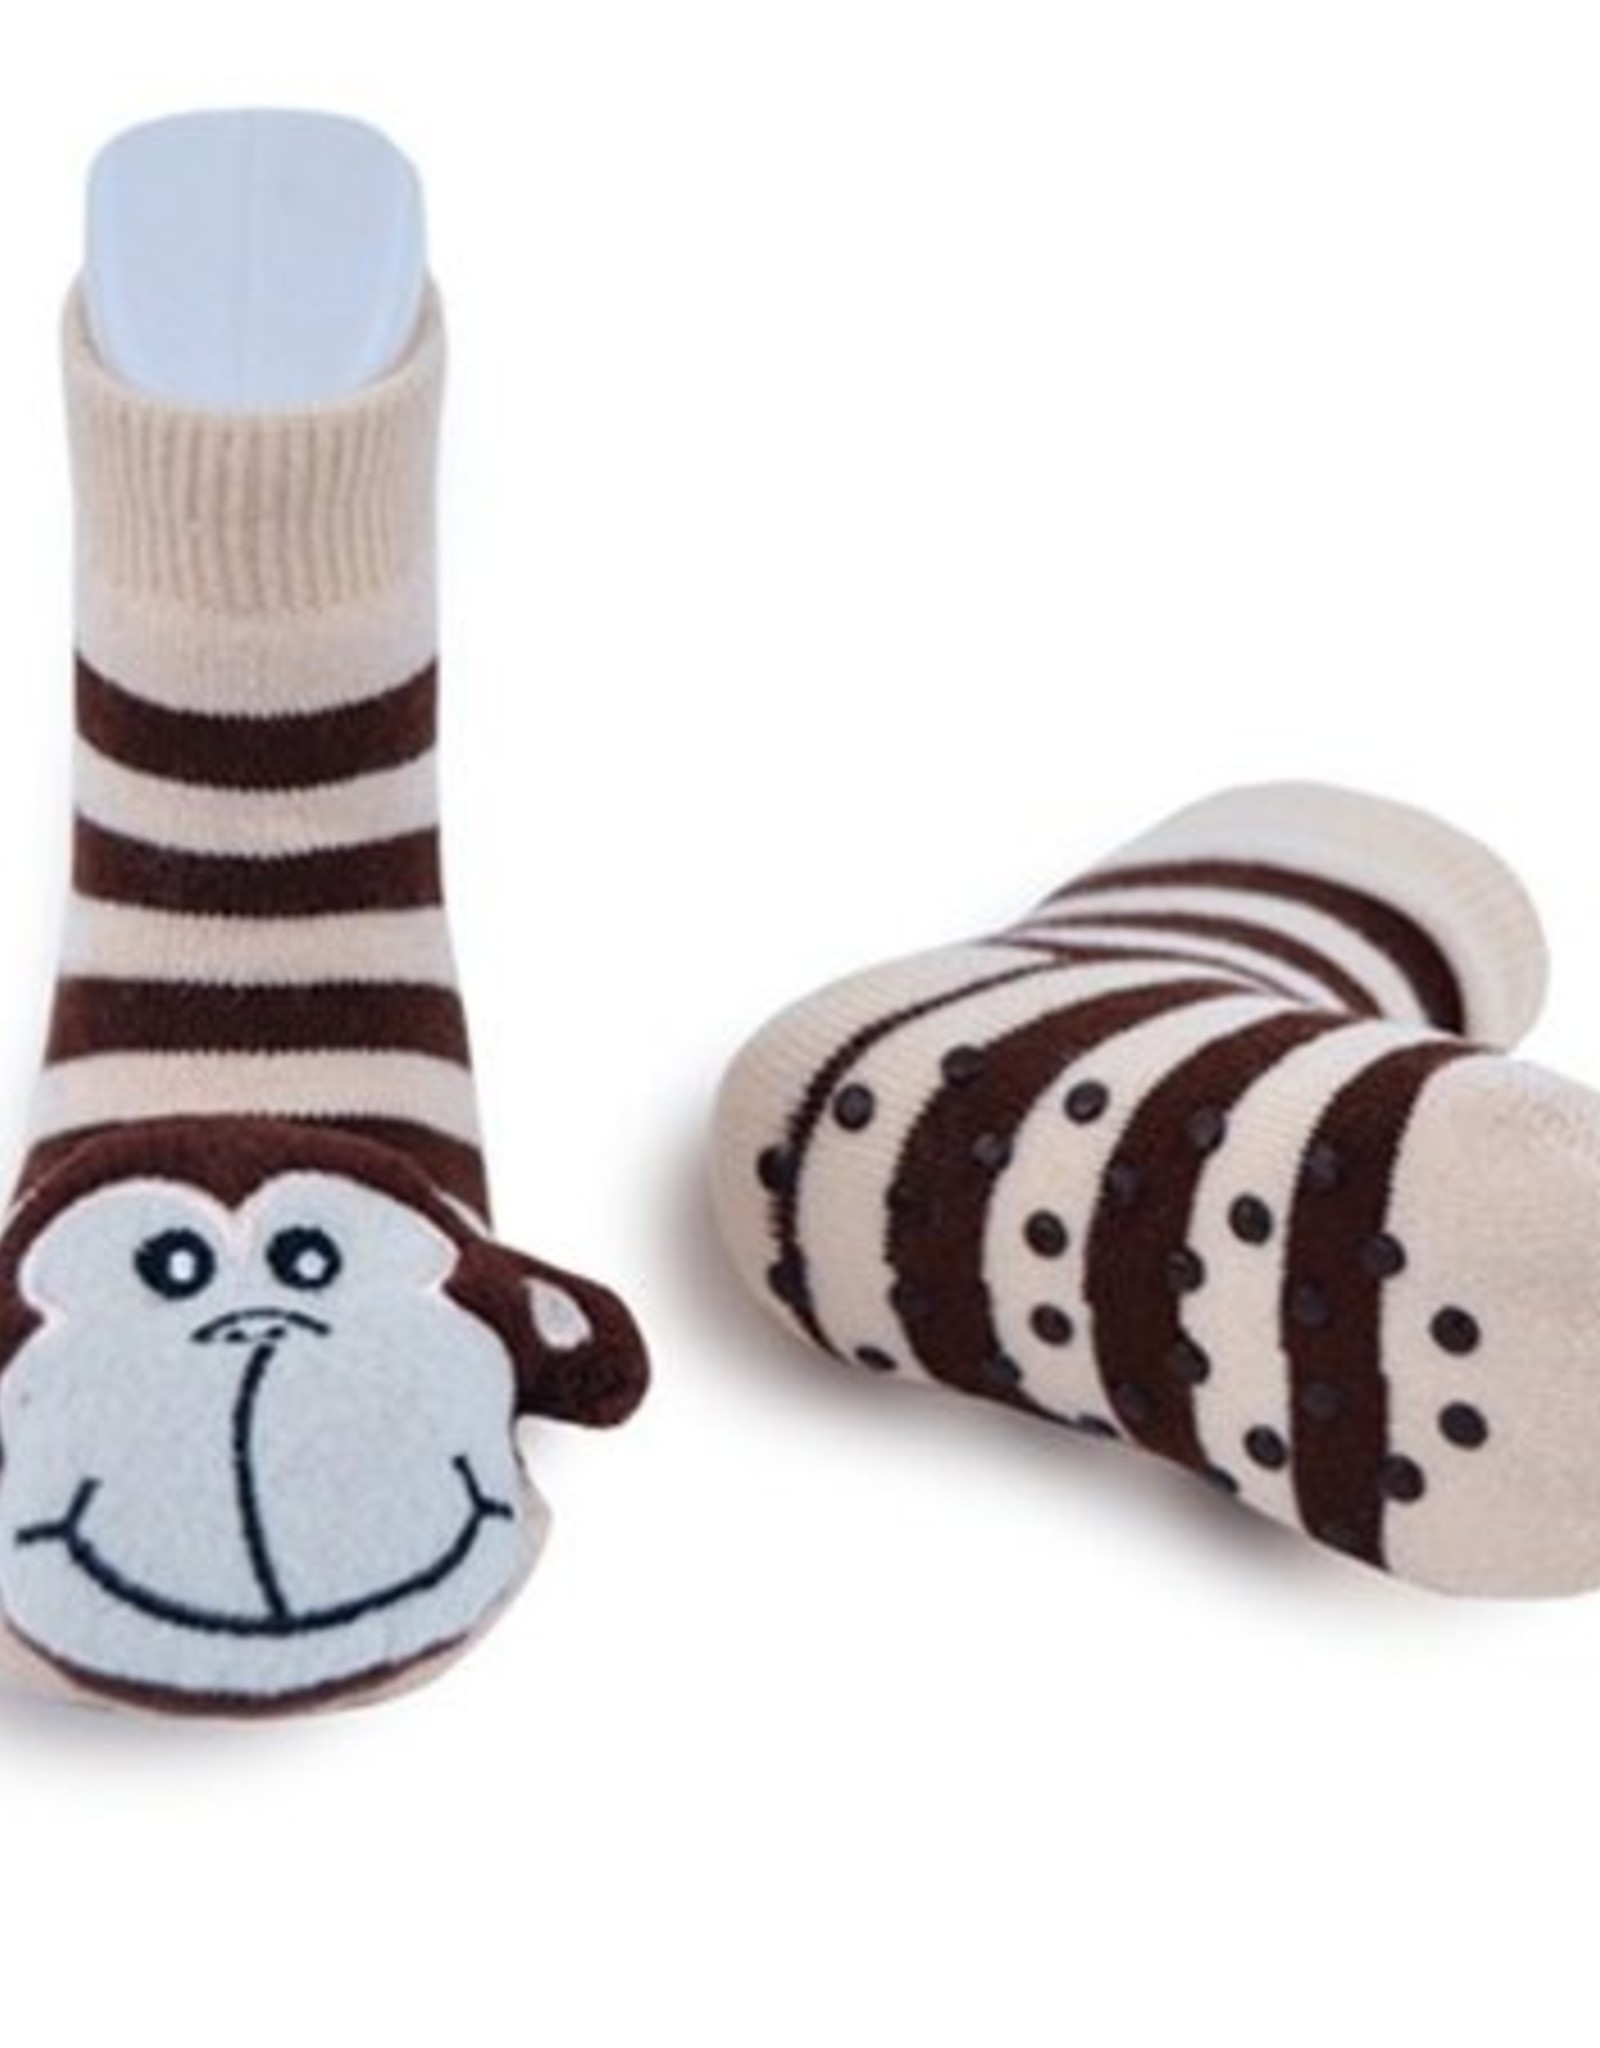 Piero Liventi Piero Liventi - Rattle Socks Monkey Boy 0-1